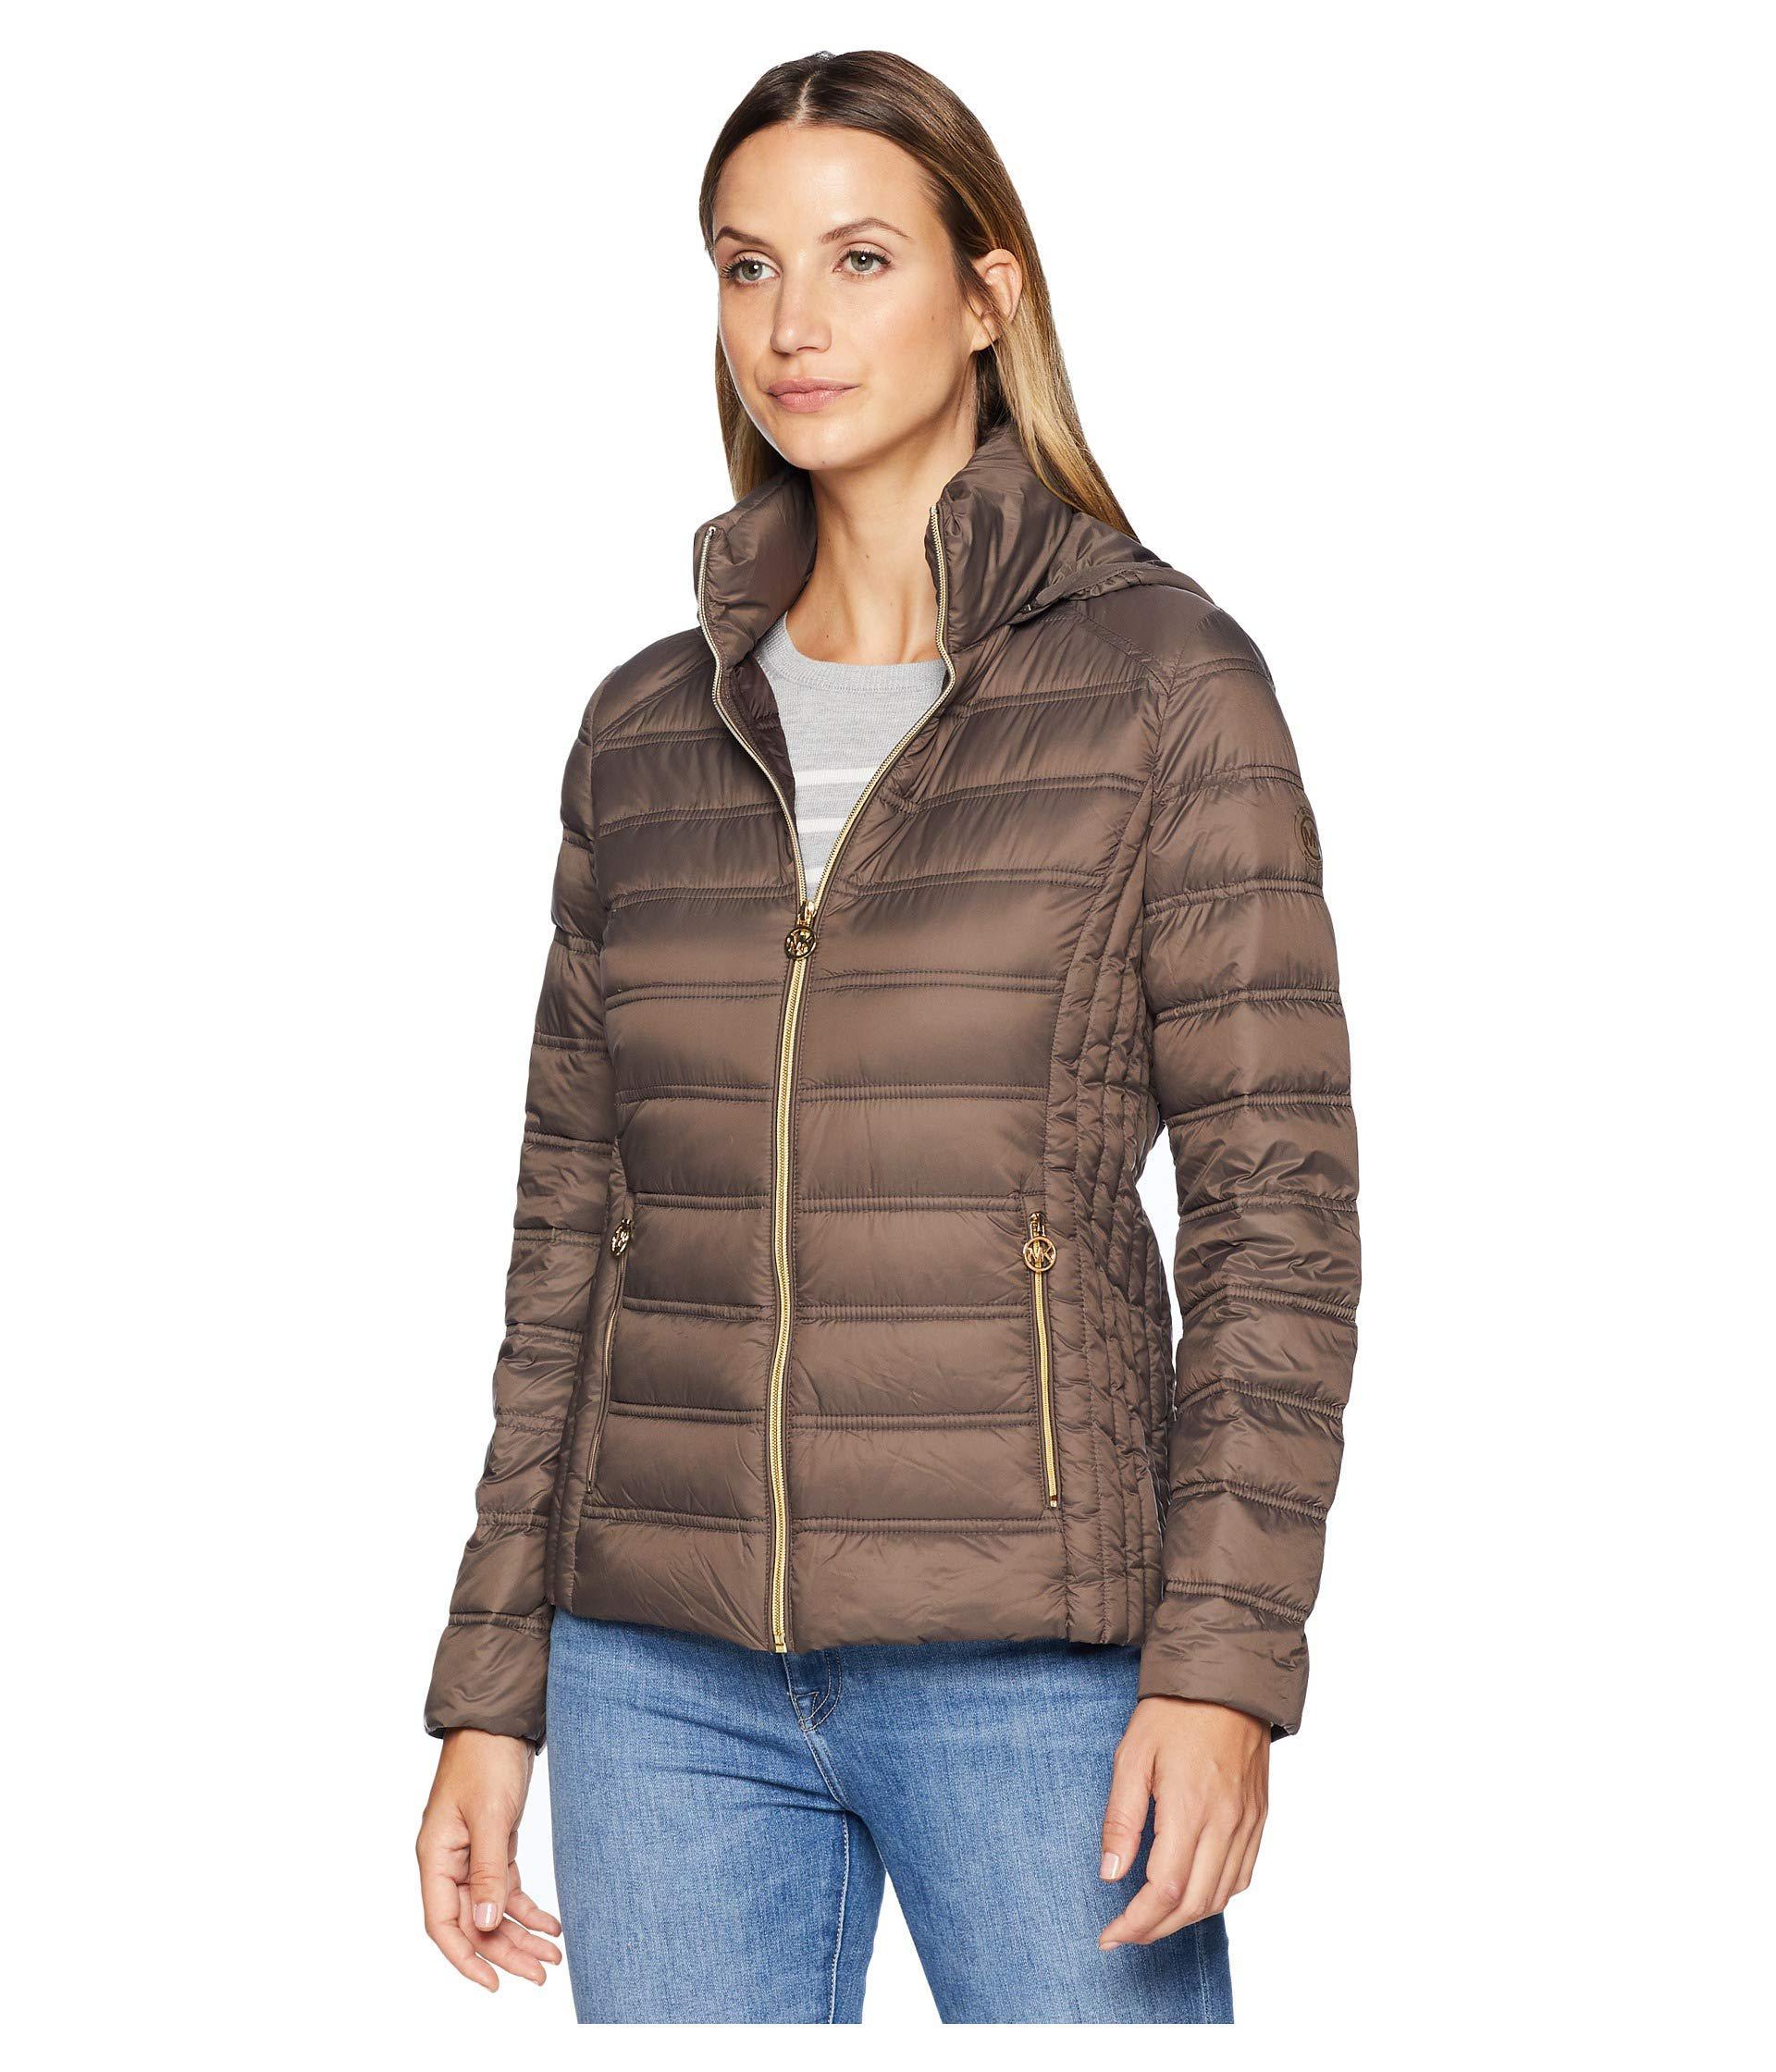 fc200d386021 Lyst - Michael Michael Kors Zip Front Packable With Removable Hood M823157g  (mocha) Women s Coat in Brown